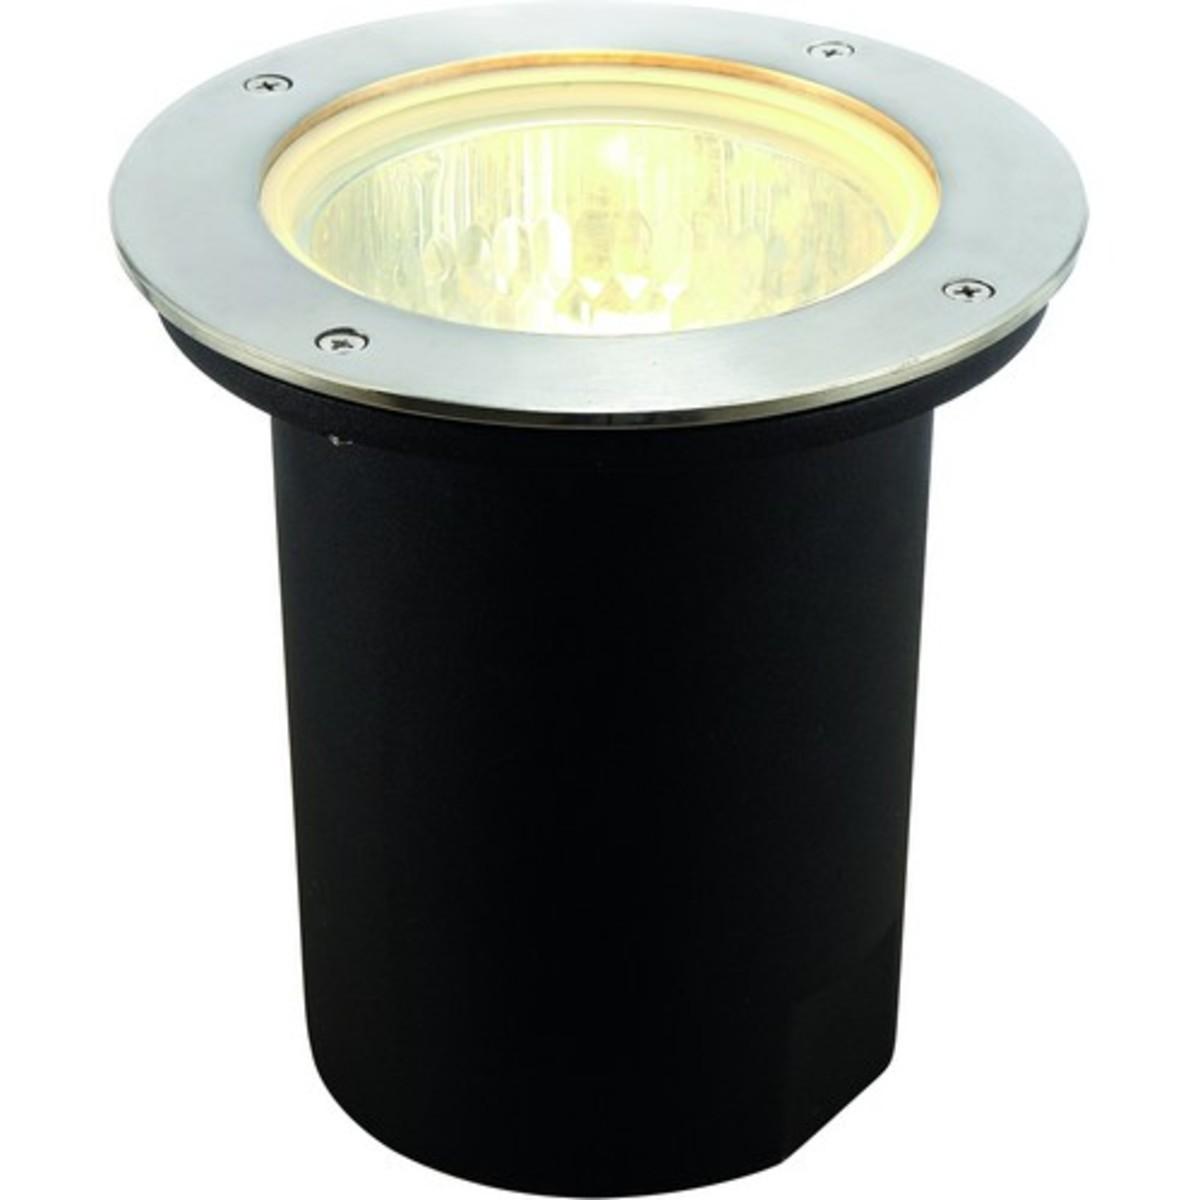 Светильник уличный Arte Lamp Piazza A6013IN-1SS IP65